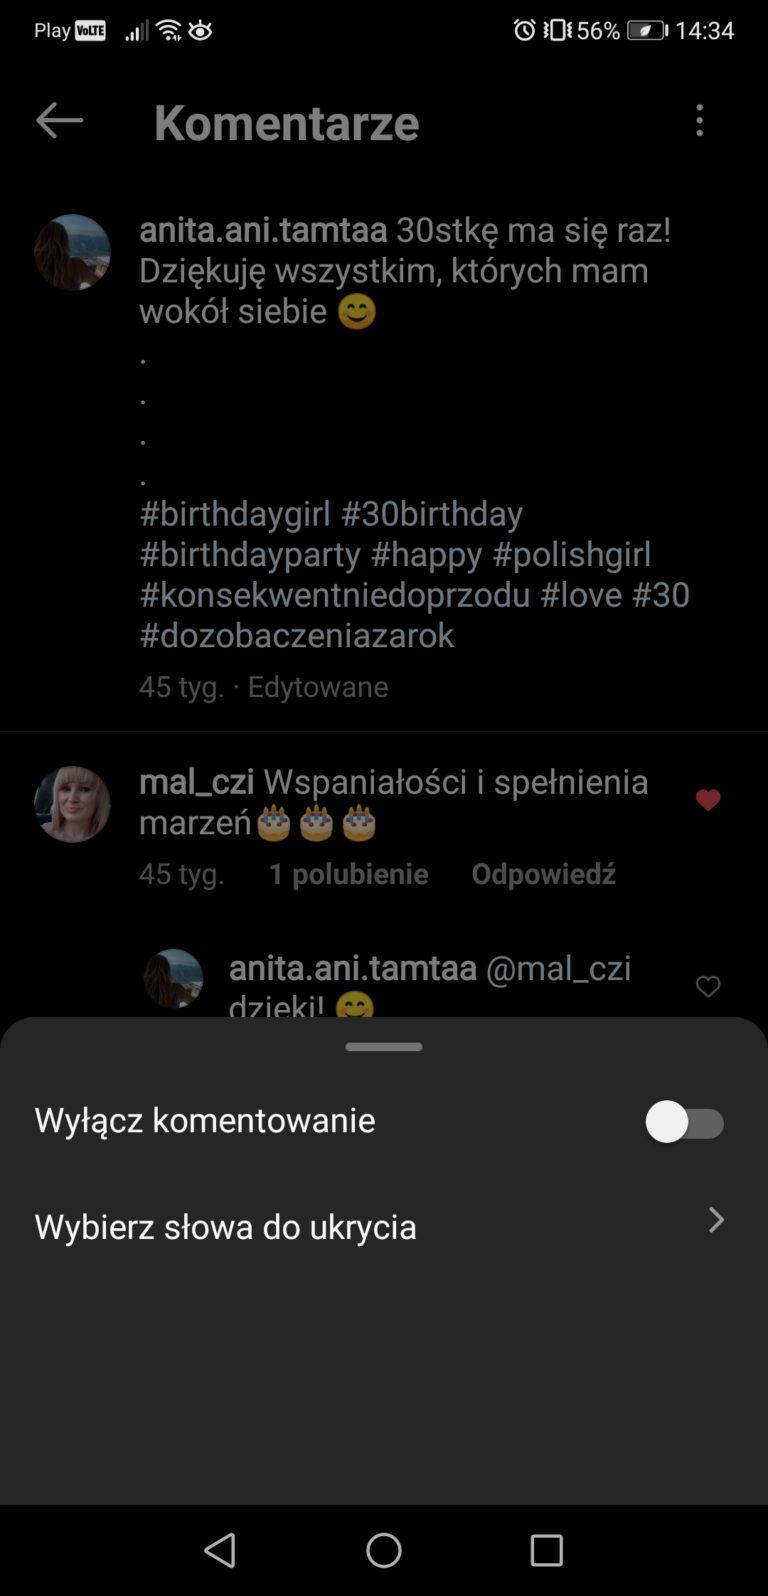 komentarze instagram ustawienia